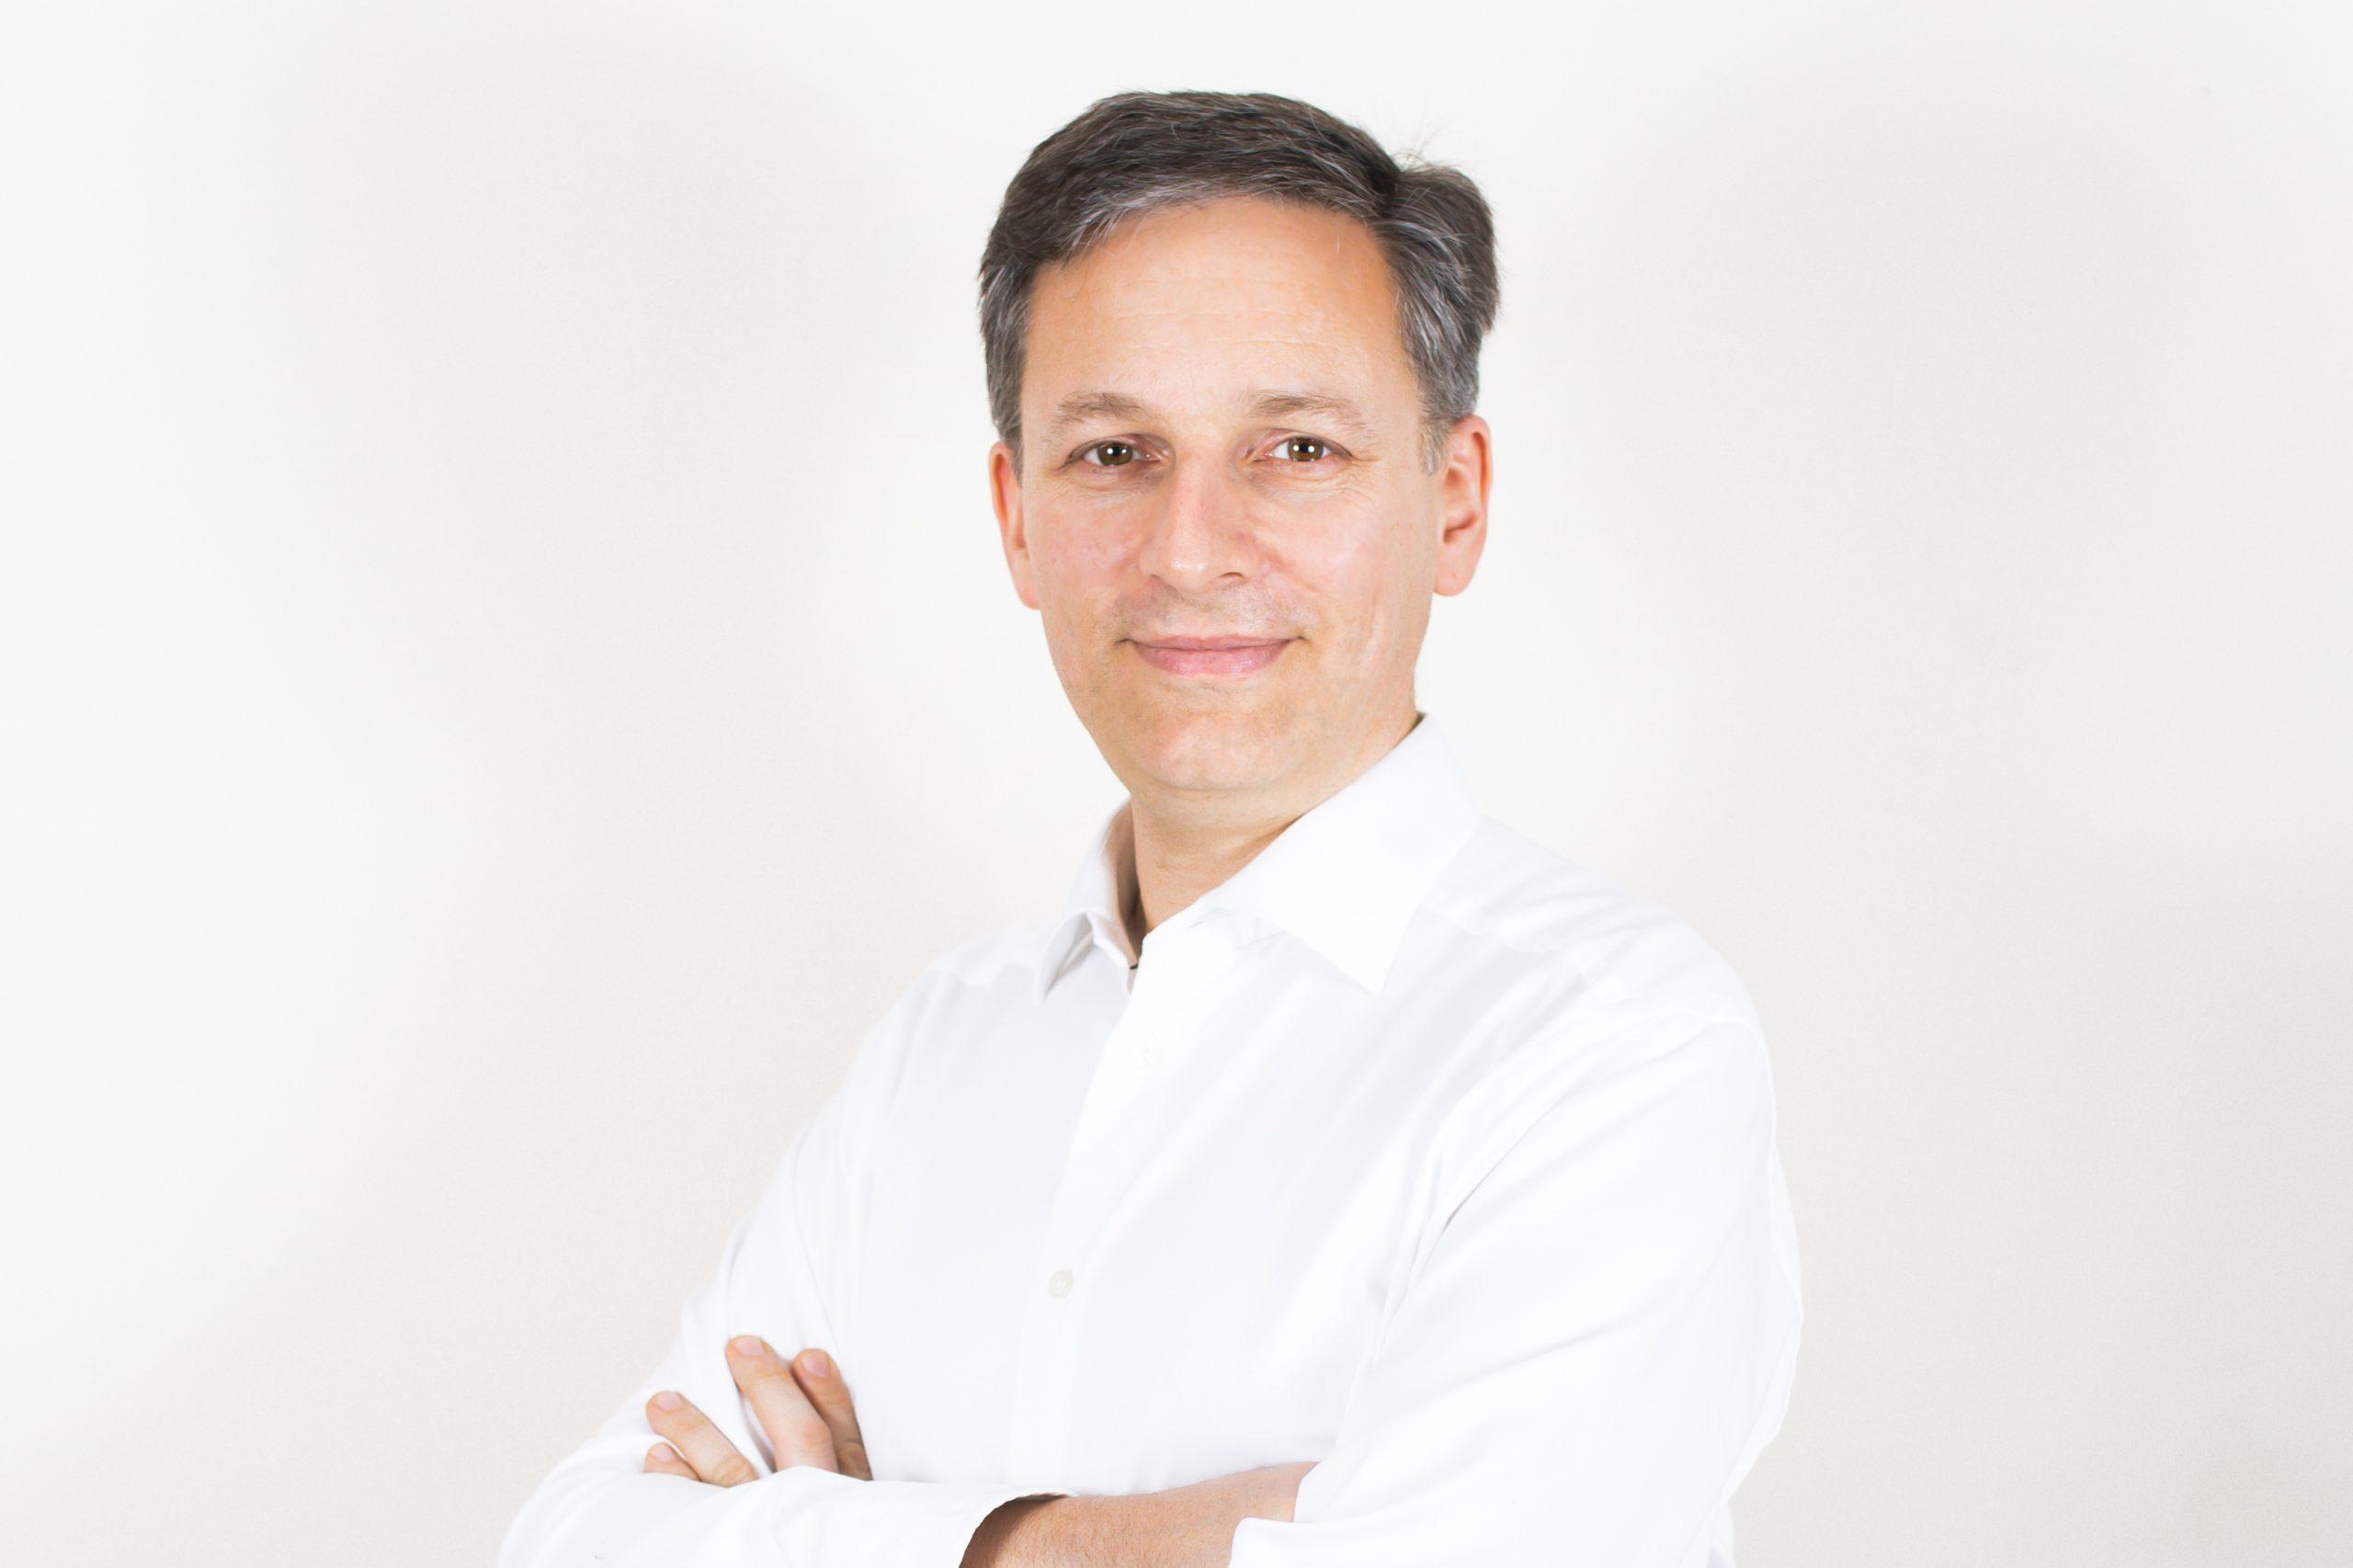 Augenarzt Dr. med. Tobias Riedel in Dresden